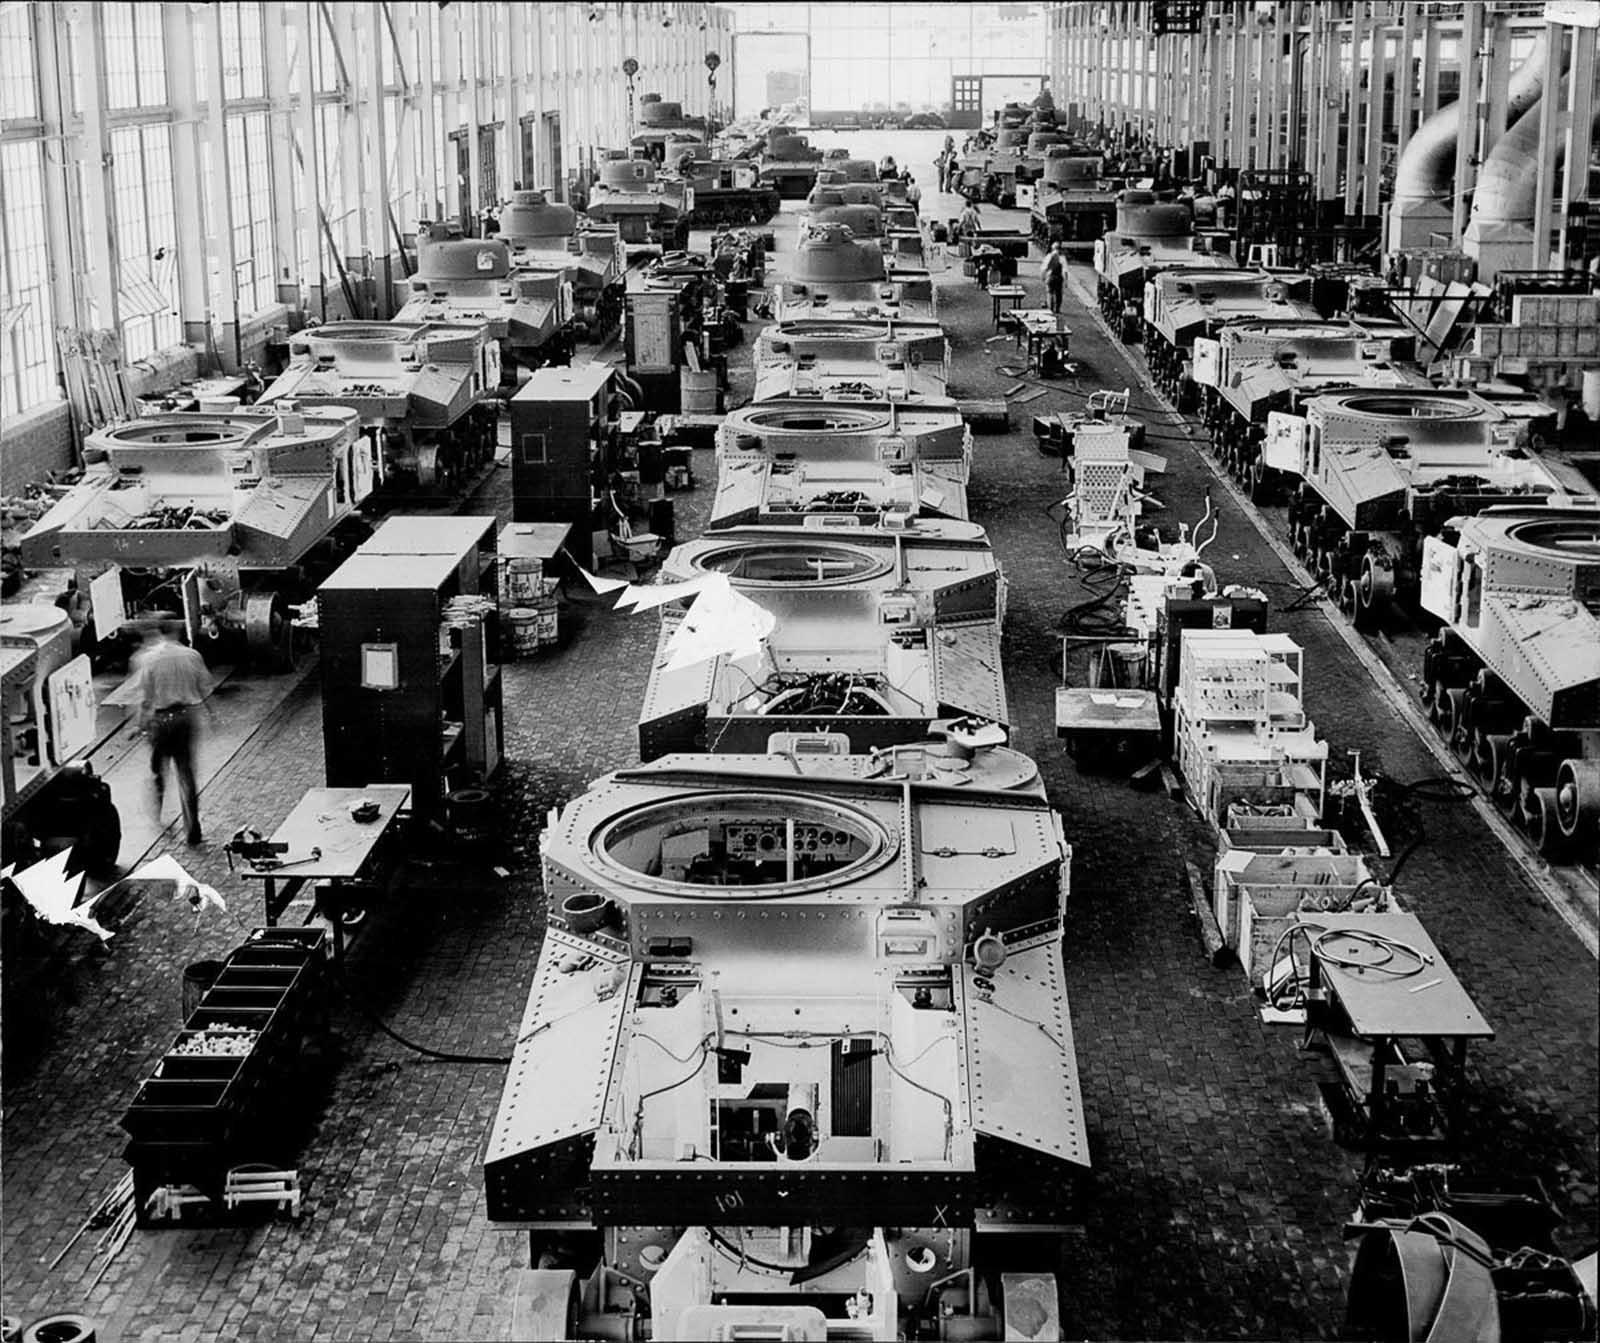 Una planta de ensamblaje de automóviles Chrysler en Detroit, reconfigurada para producir tanques. 1942.